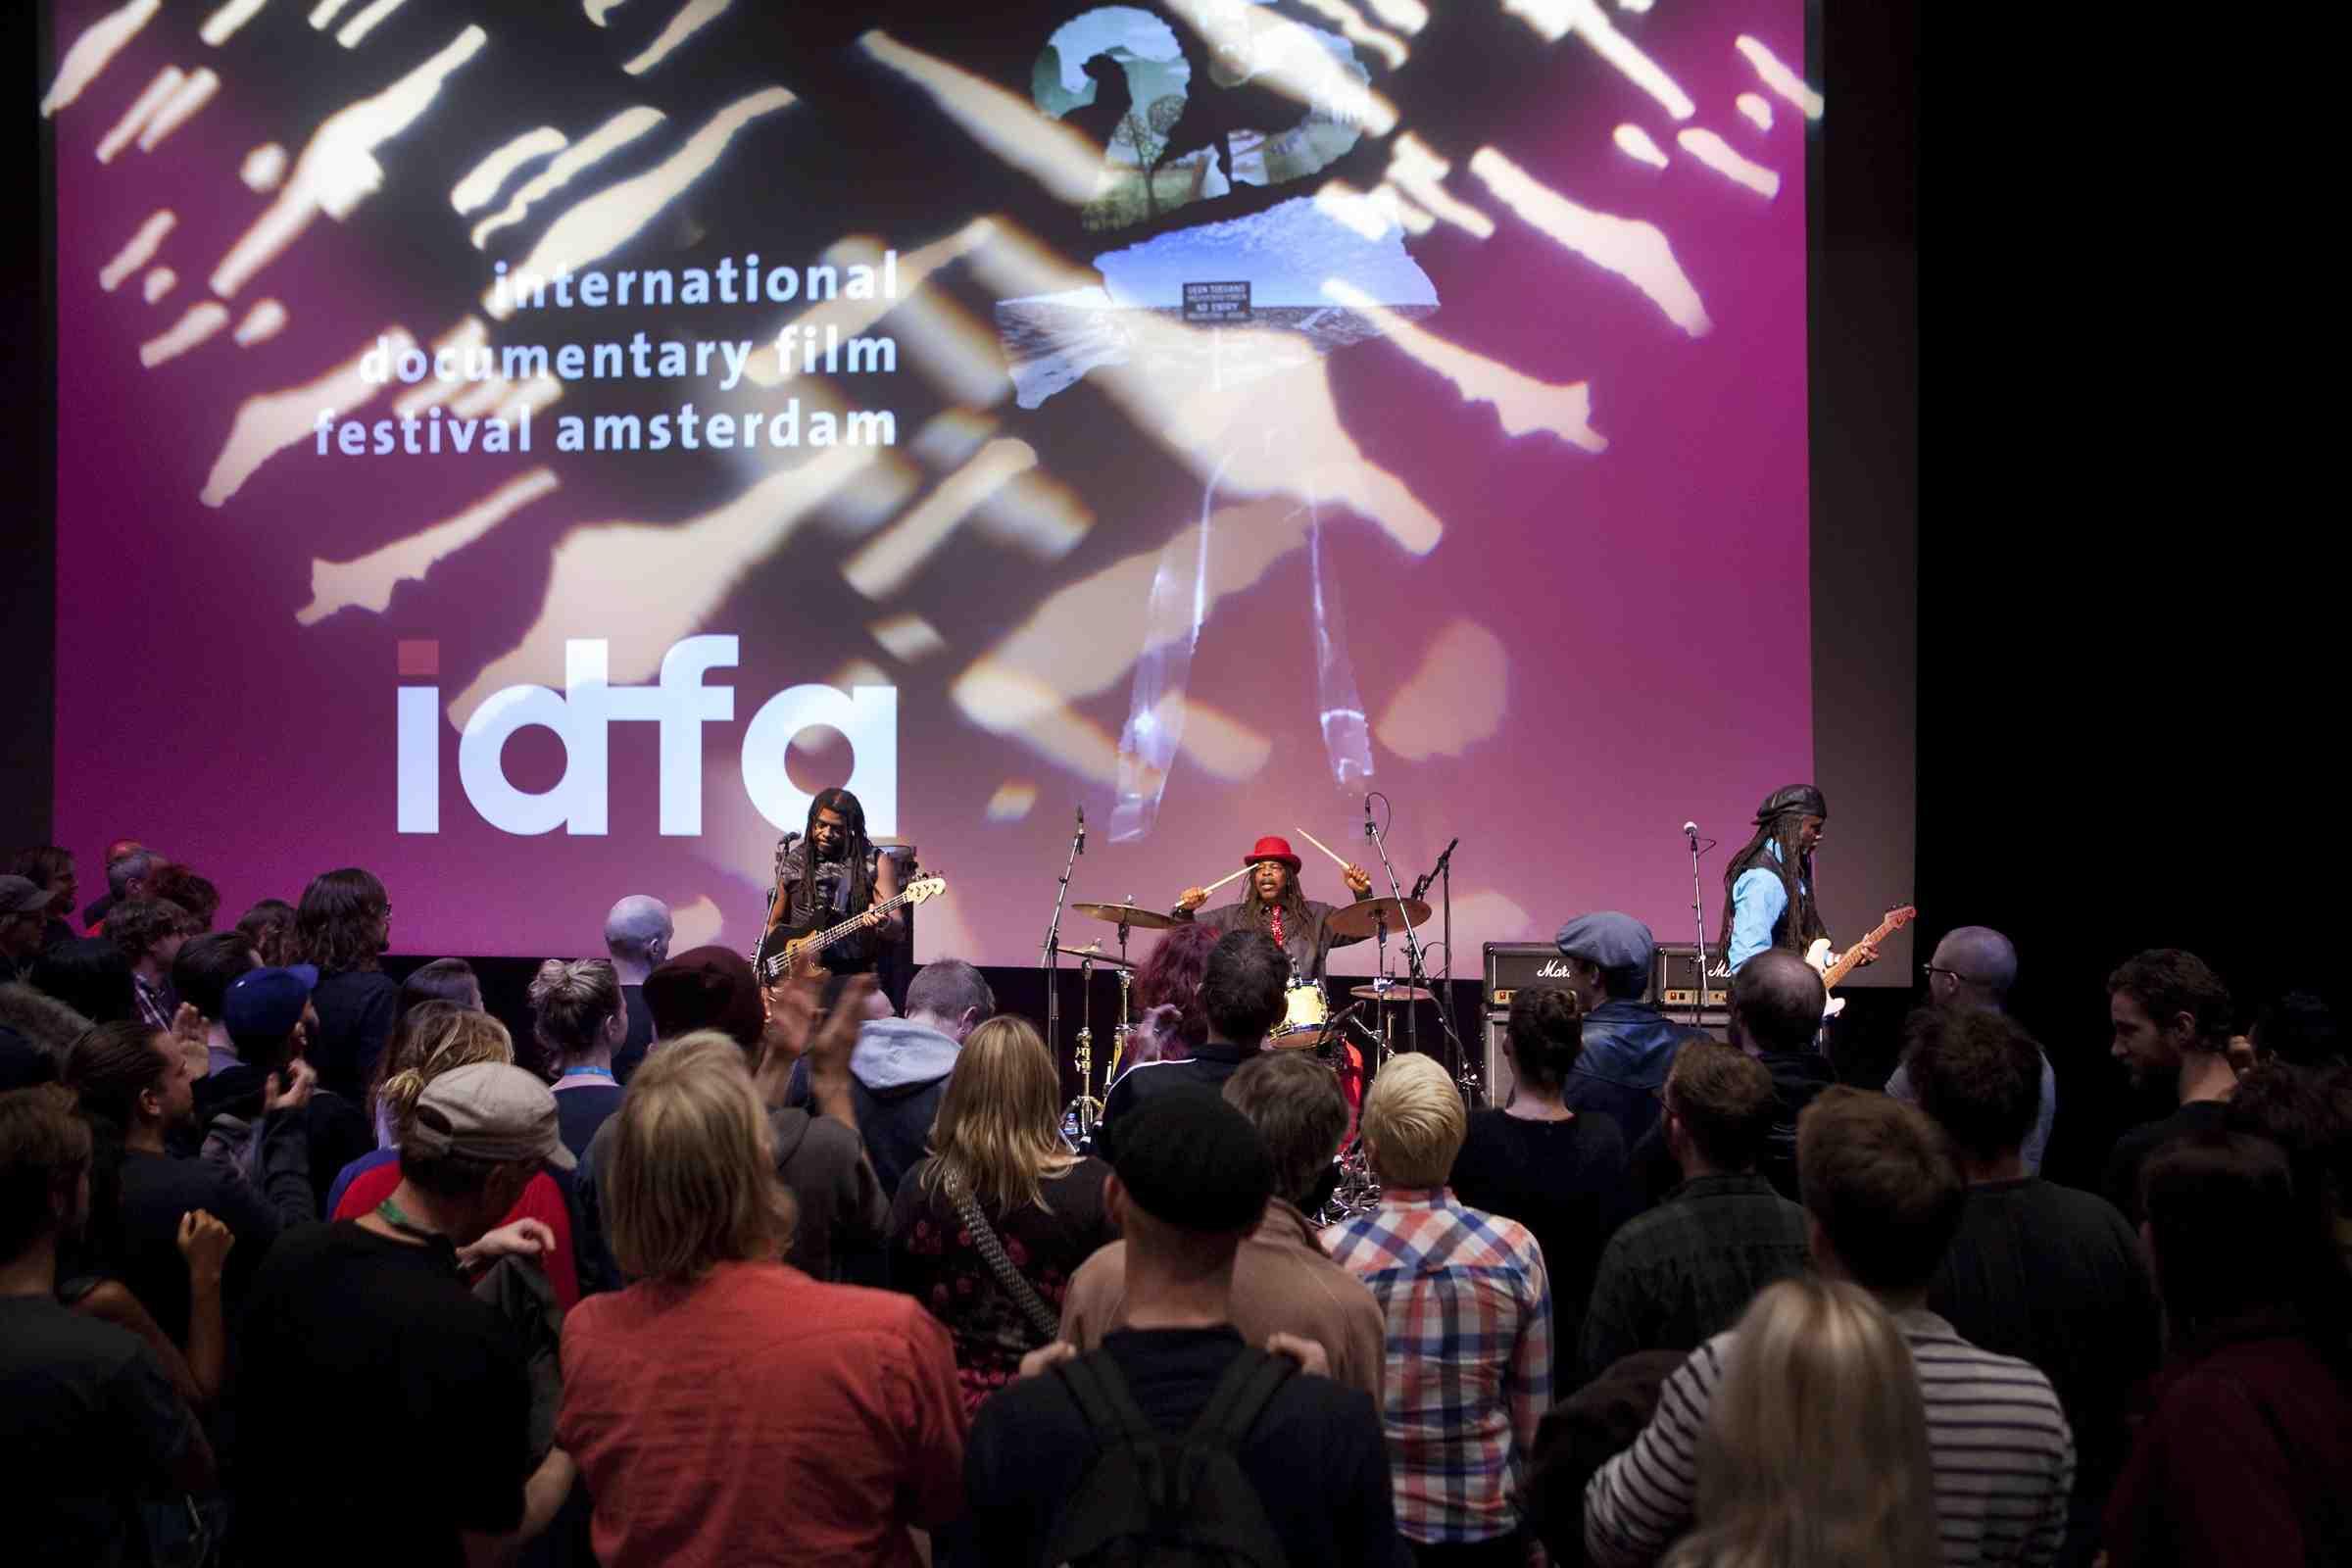 IDFA 2012 Concert